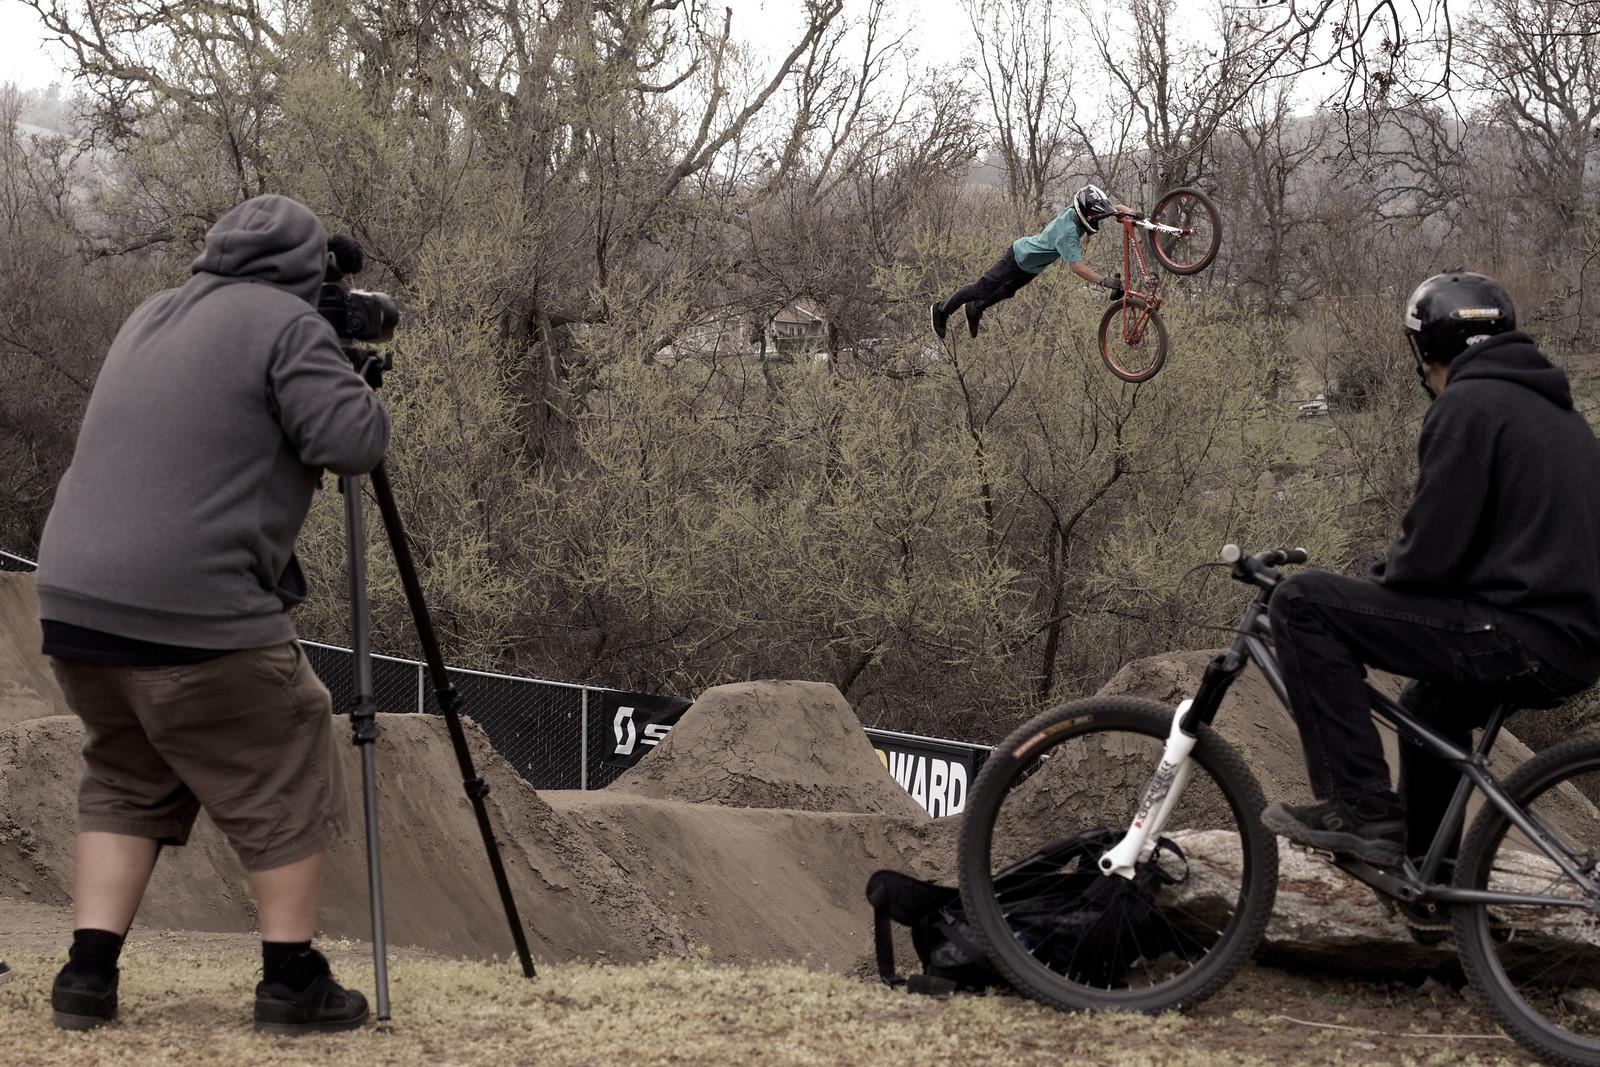 James Visser Superman - corytepper.com - Mountain Biking Pictures - Vital MTB